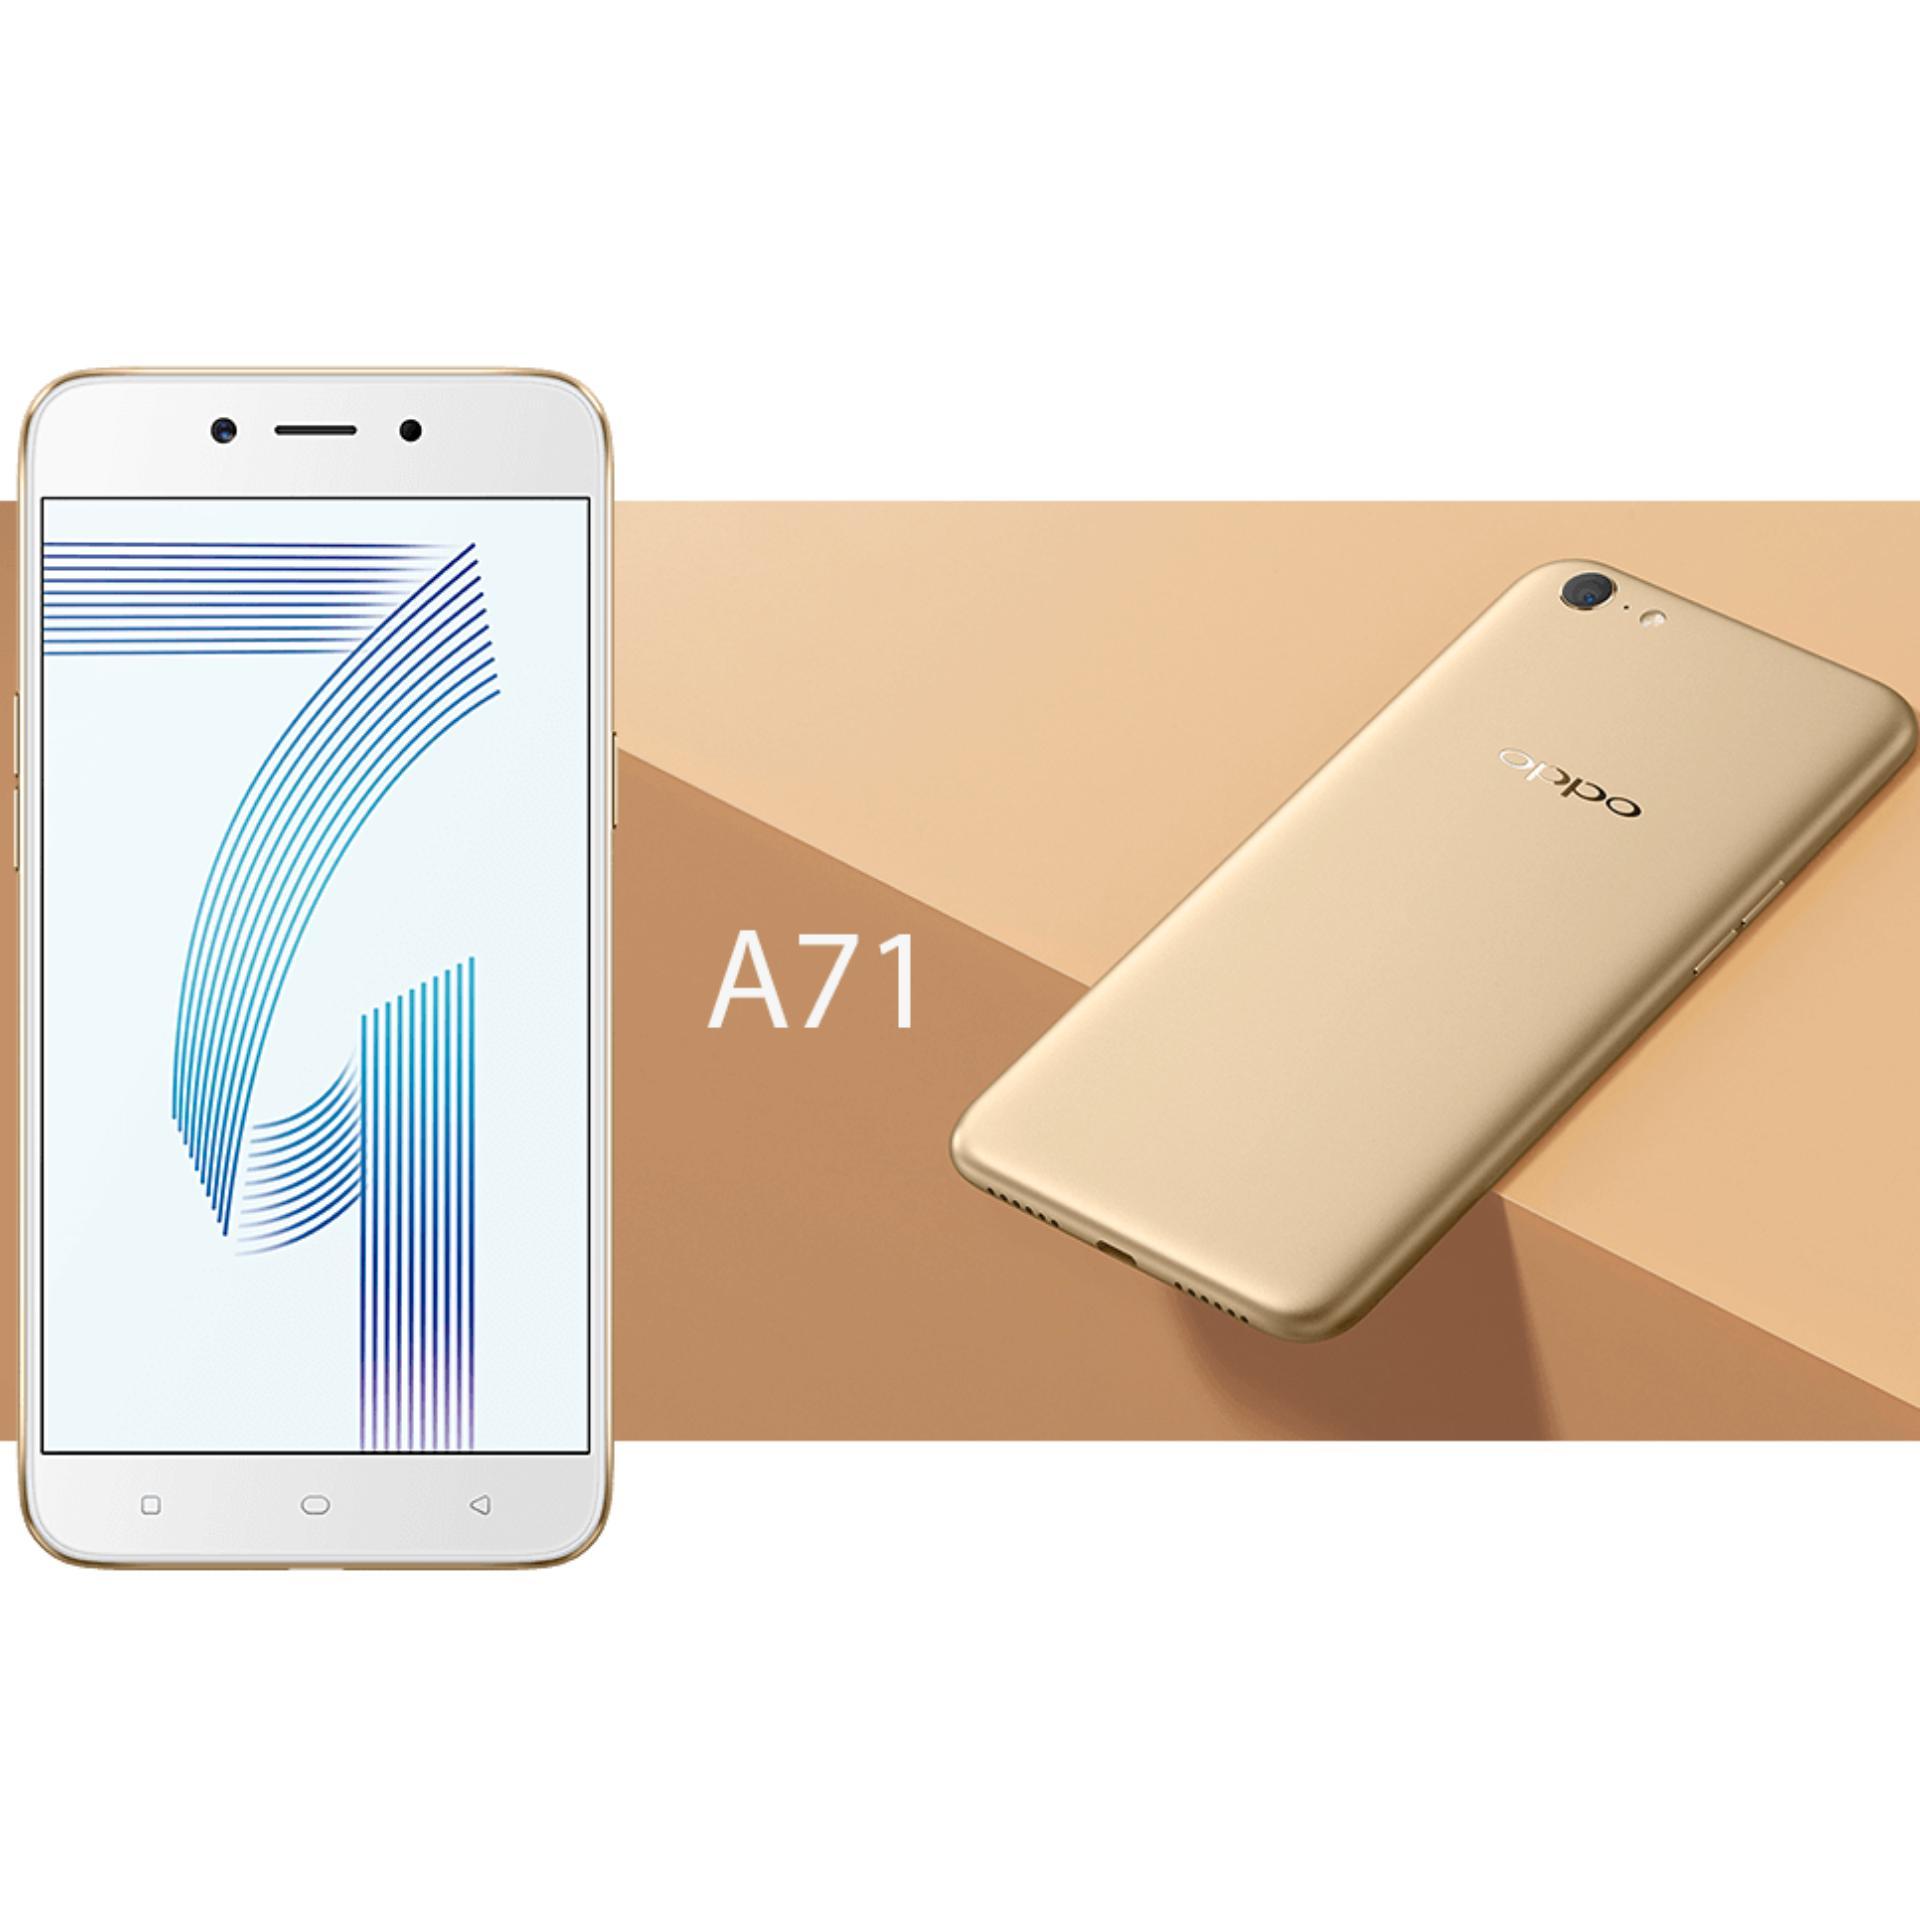 Oppo F3 Smartphone Gold Ram 4gb64gb Free 8 Bonus Bisa Kredit Po F9 4gb 64gb Bonushf Bluetooth Pubg Crate Sunrise Red Harga Baru Review Spesifikasi Source A71 Hp Brandcode 3310 Reborn